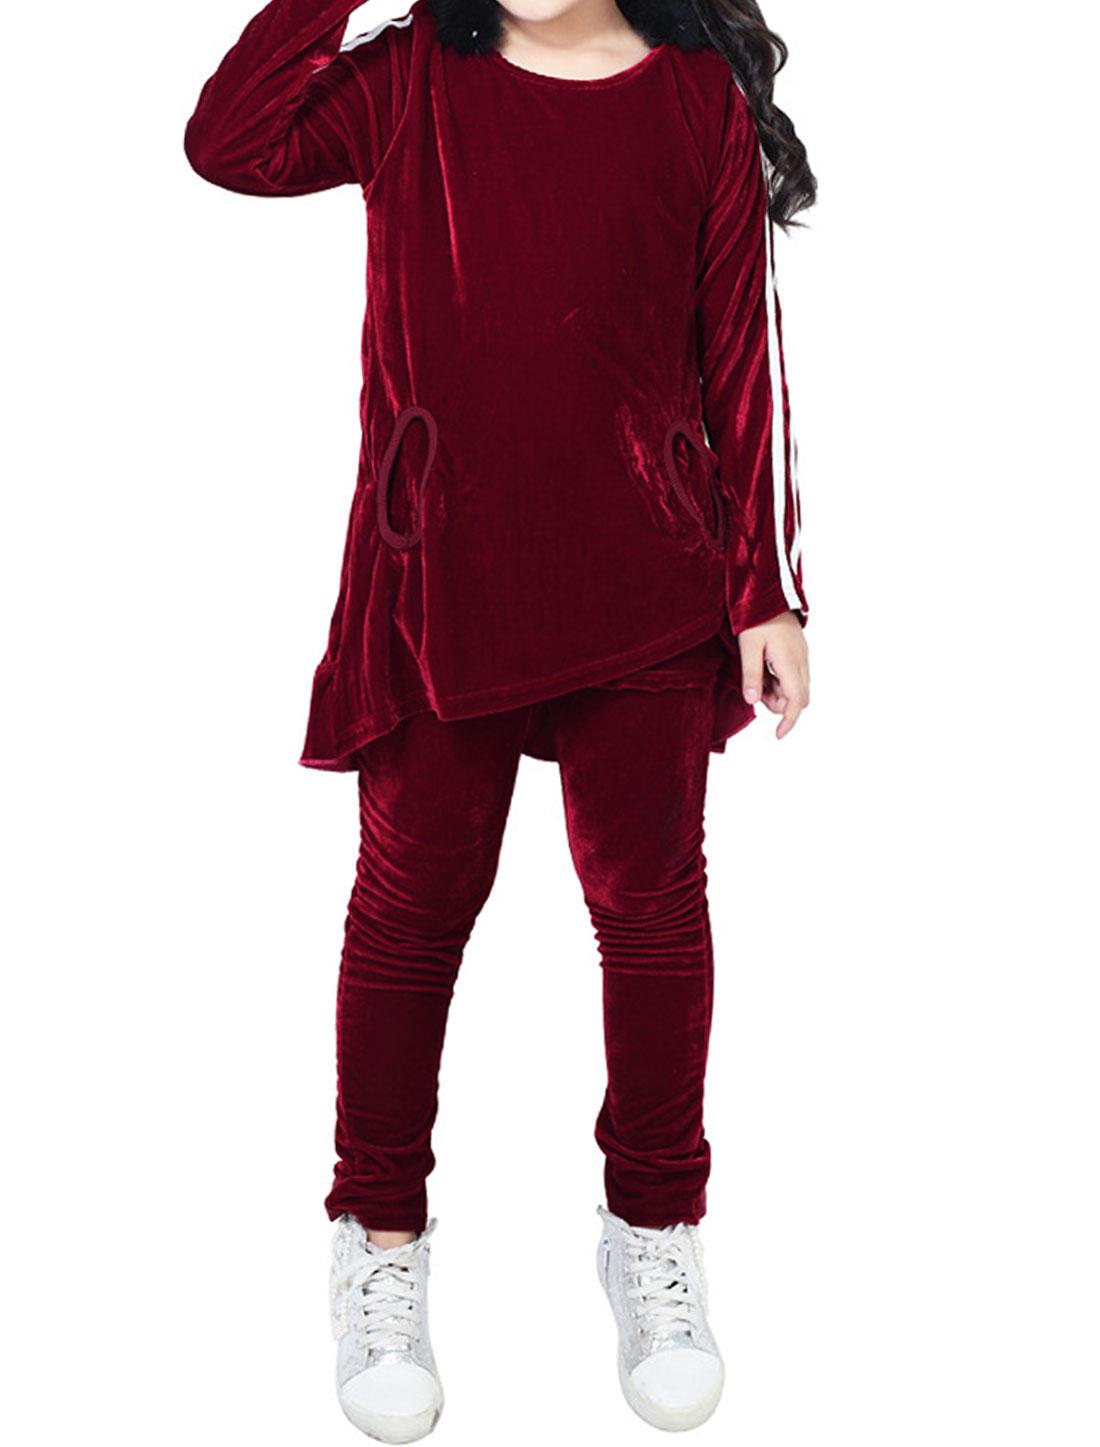 Girls Faux Fur Decor Long Sleeve Velvet Tunic Top w Pants Set Burgundy 6